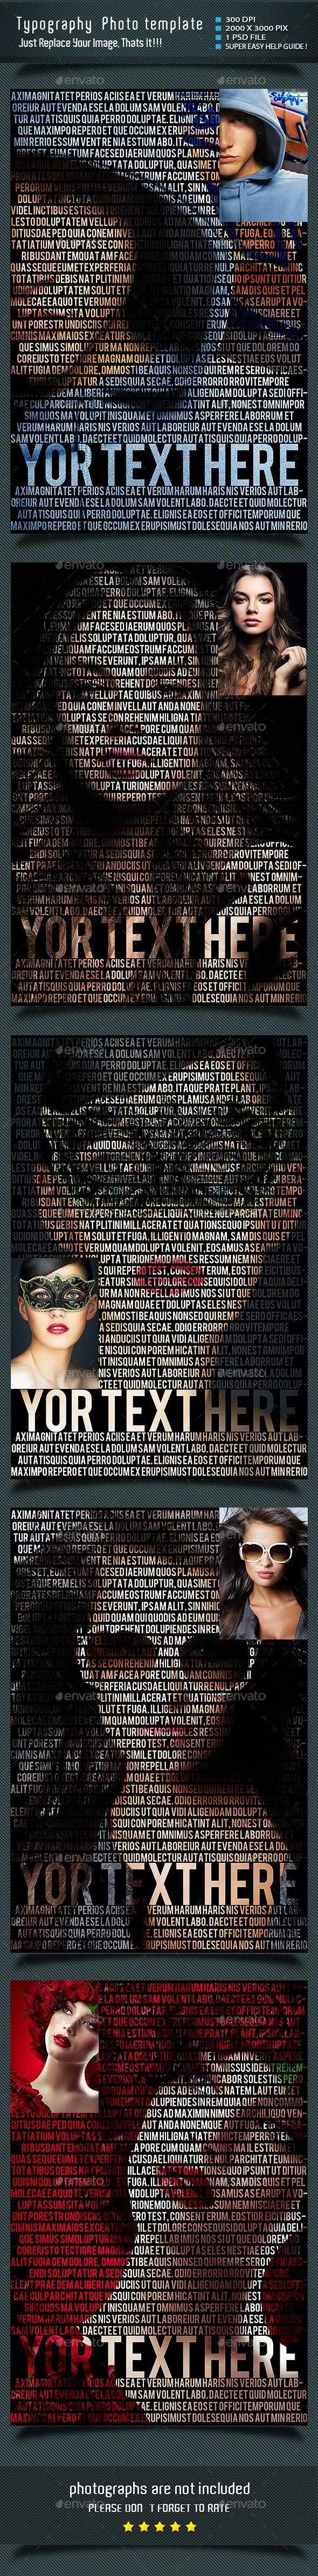 Typography Photo Template PSD #design Download: http://graphicriver.net/item/typography-photo-template/10000040?ref=ksioks